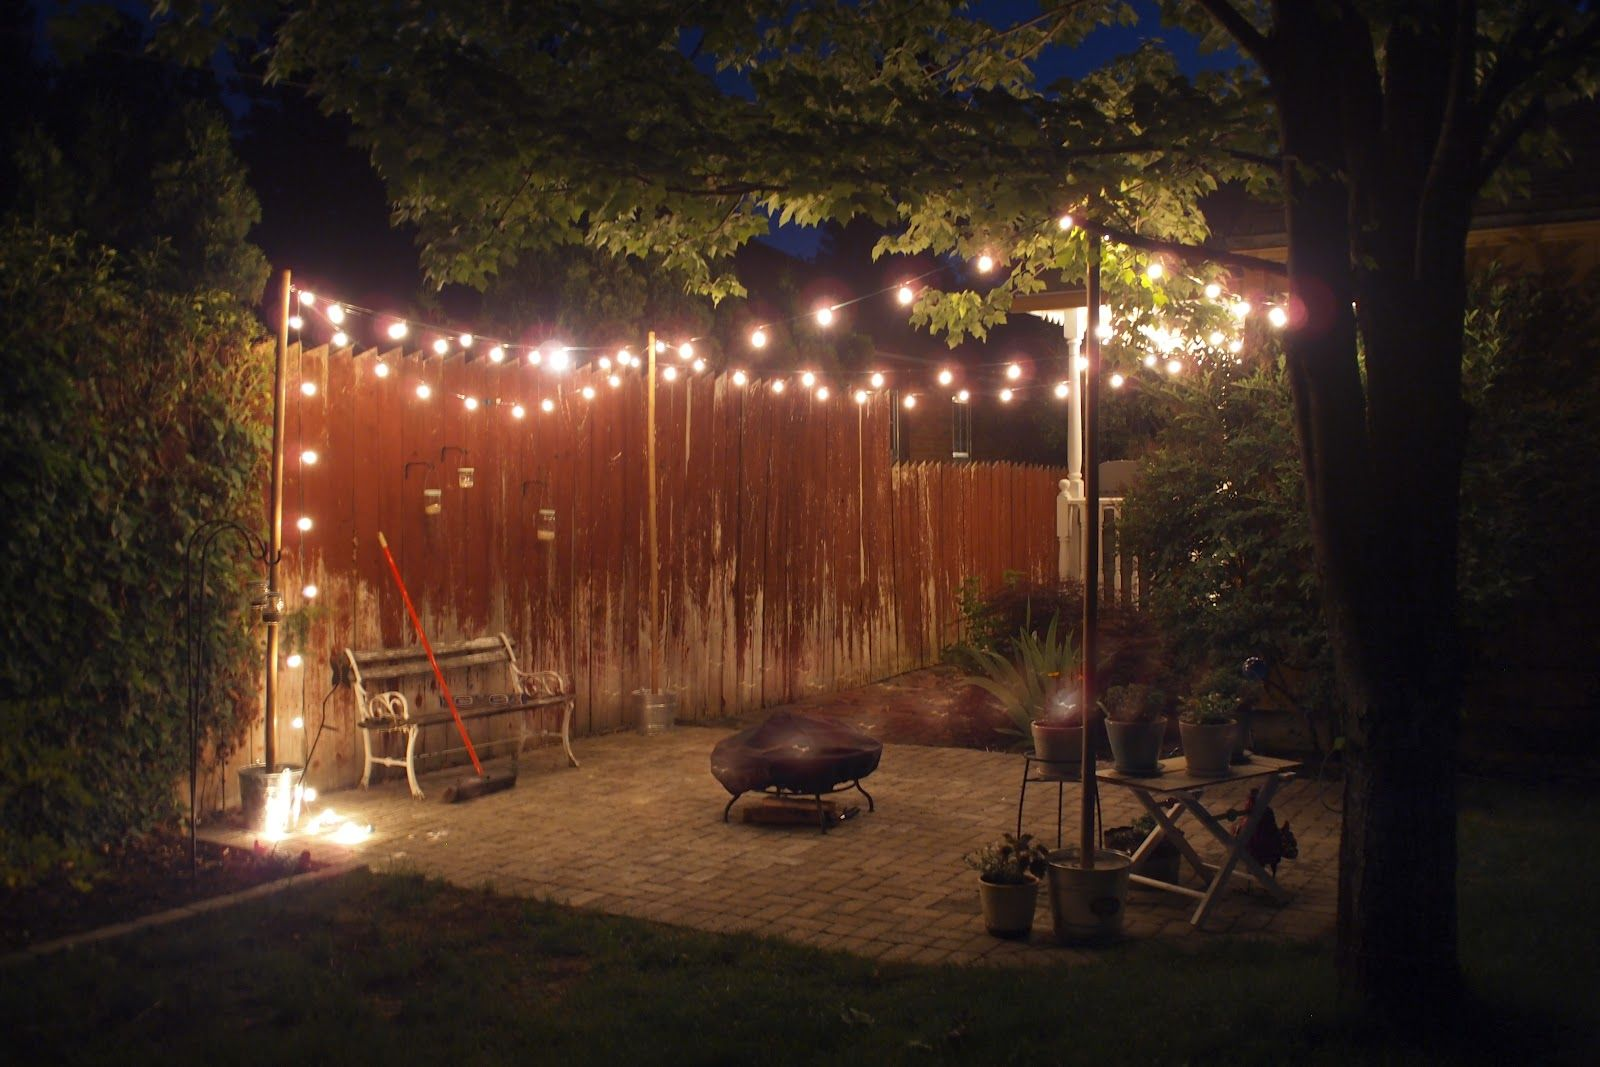 25 Socket Outdoor Patio String Light Set G50 Clear Globe Bulbs 28 Ft Black  Cord W E17 Base